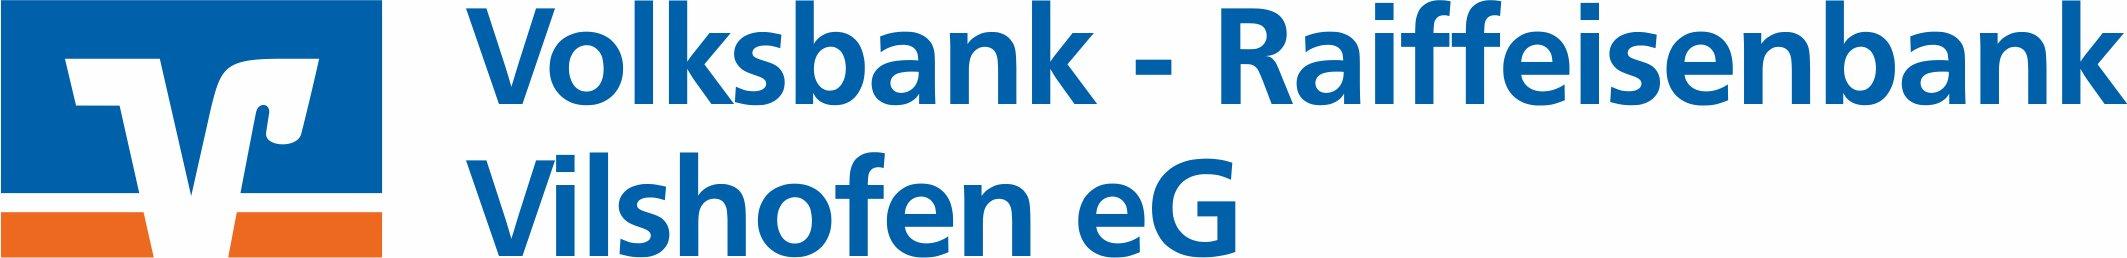 Volksbank - Raiffeisenbank Vilshofen eG